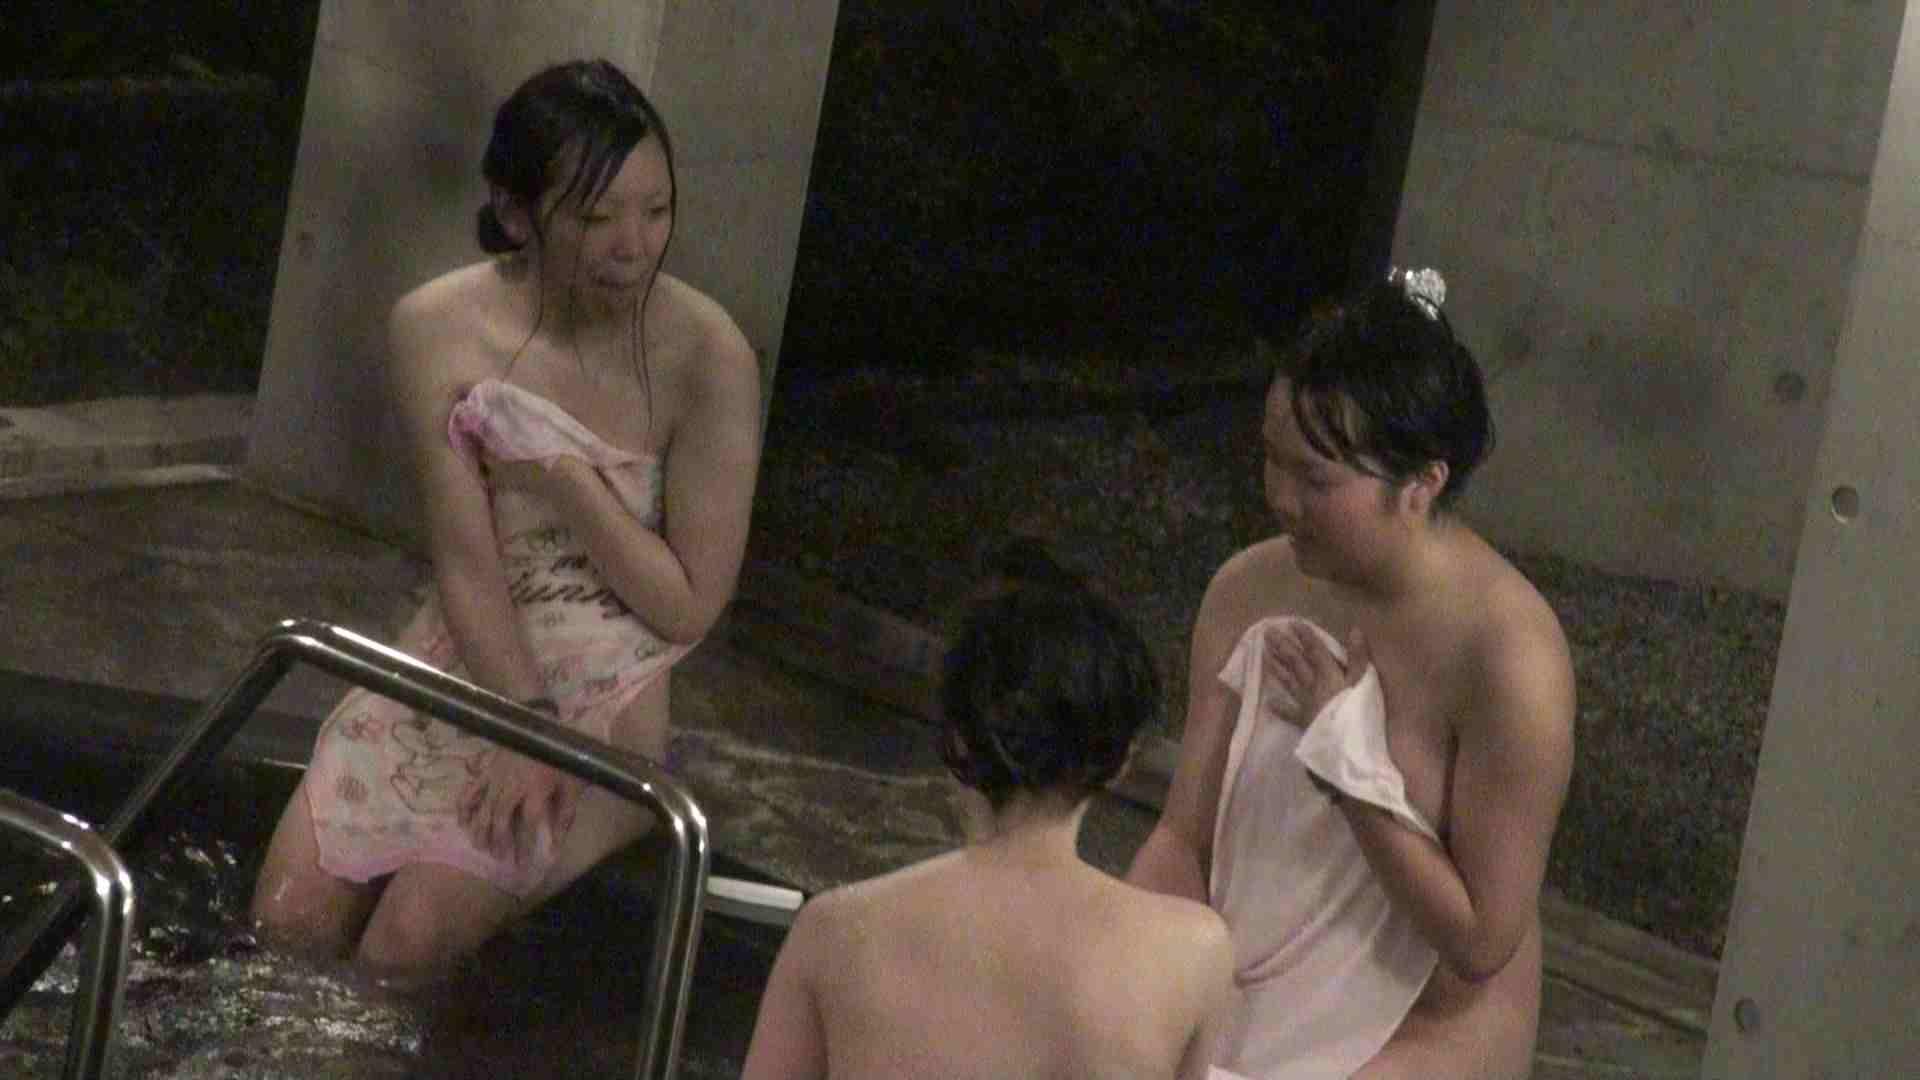 Aquaな露天風呂Vol.383 OLセックス 覗き性交動画流出 103画像 101